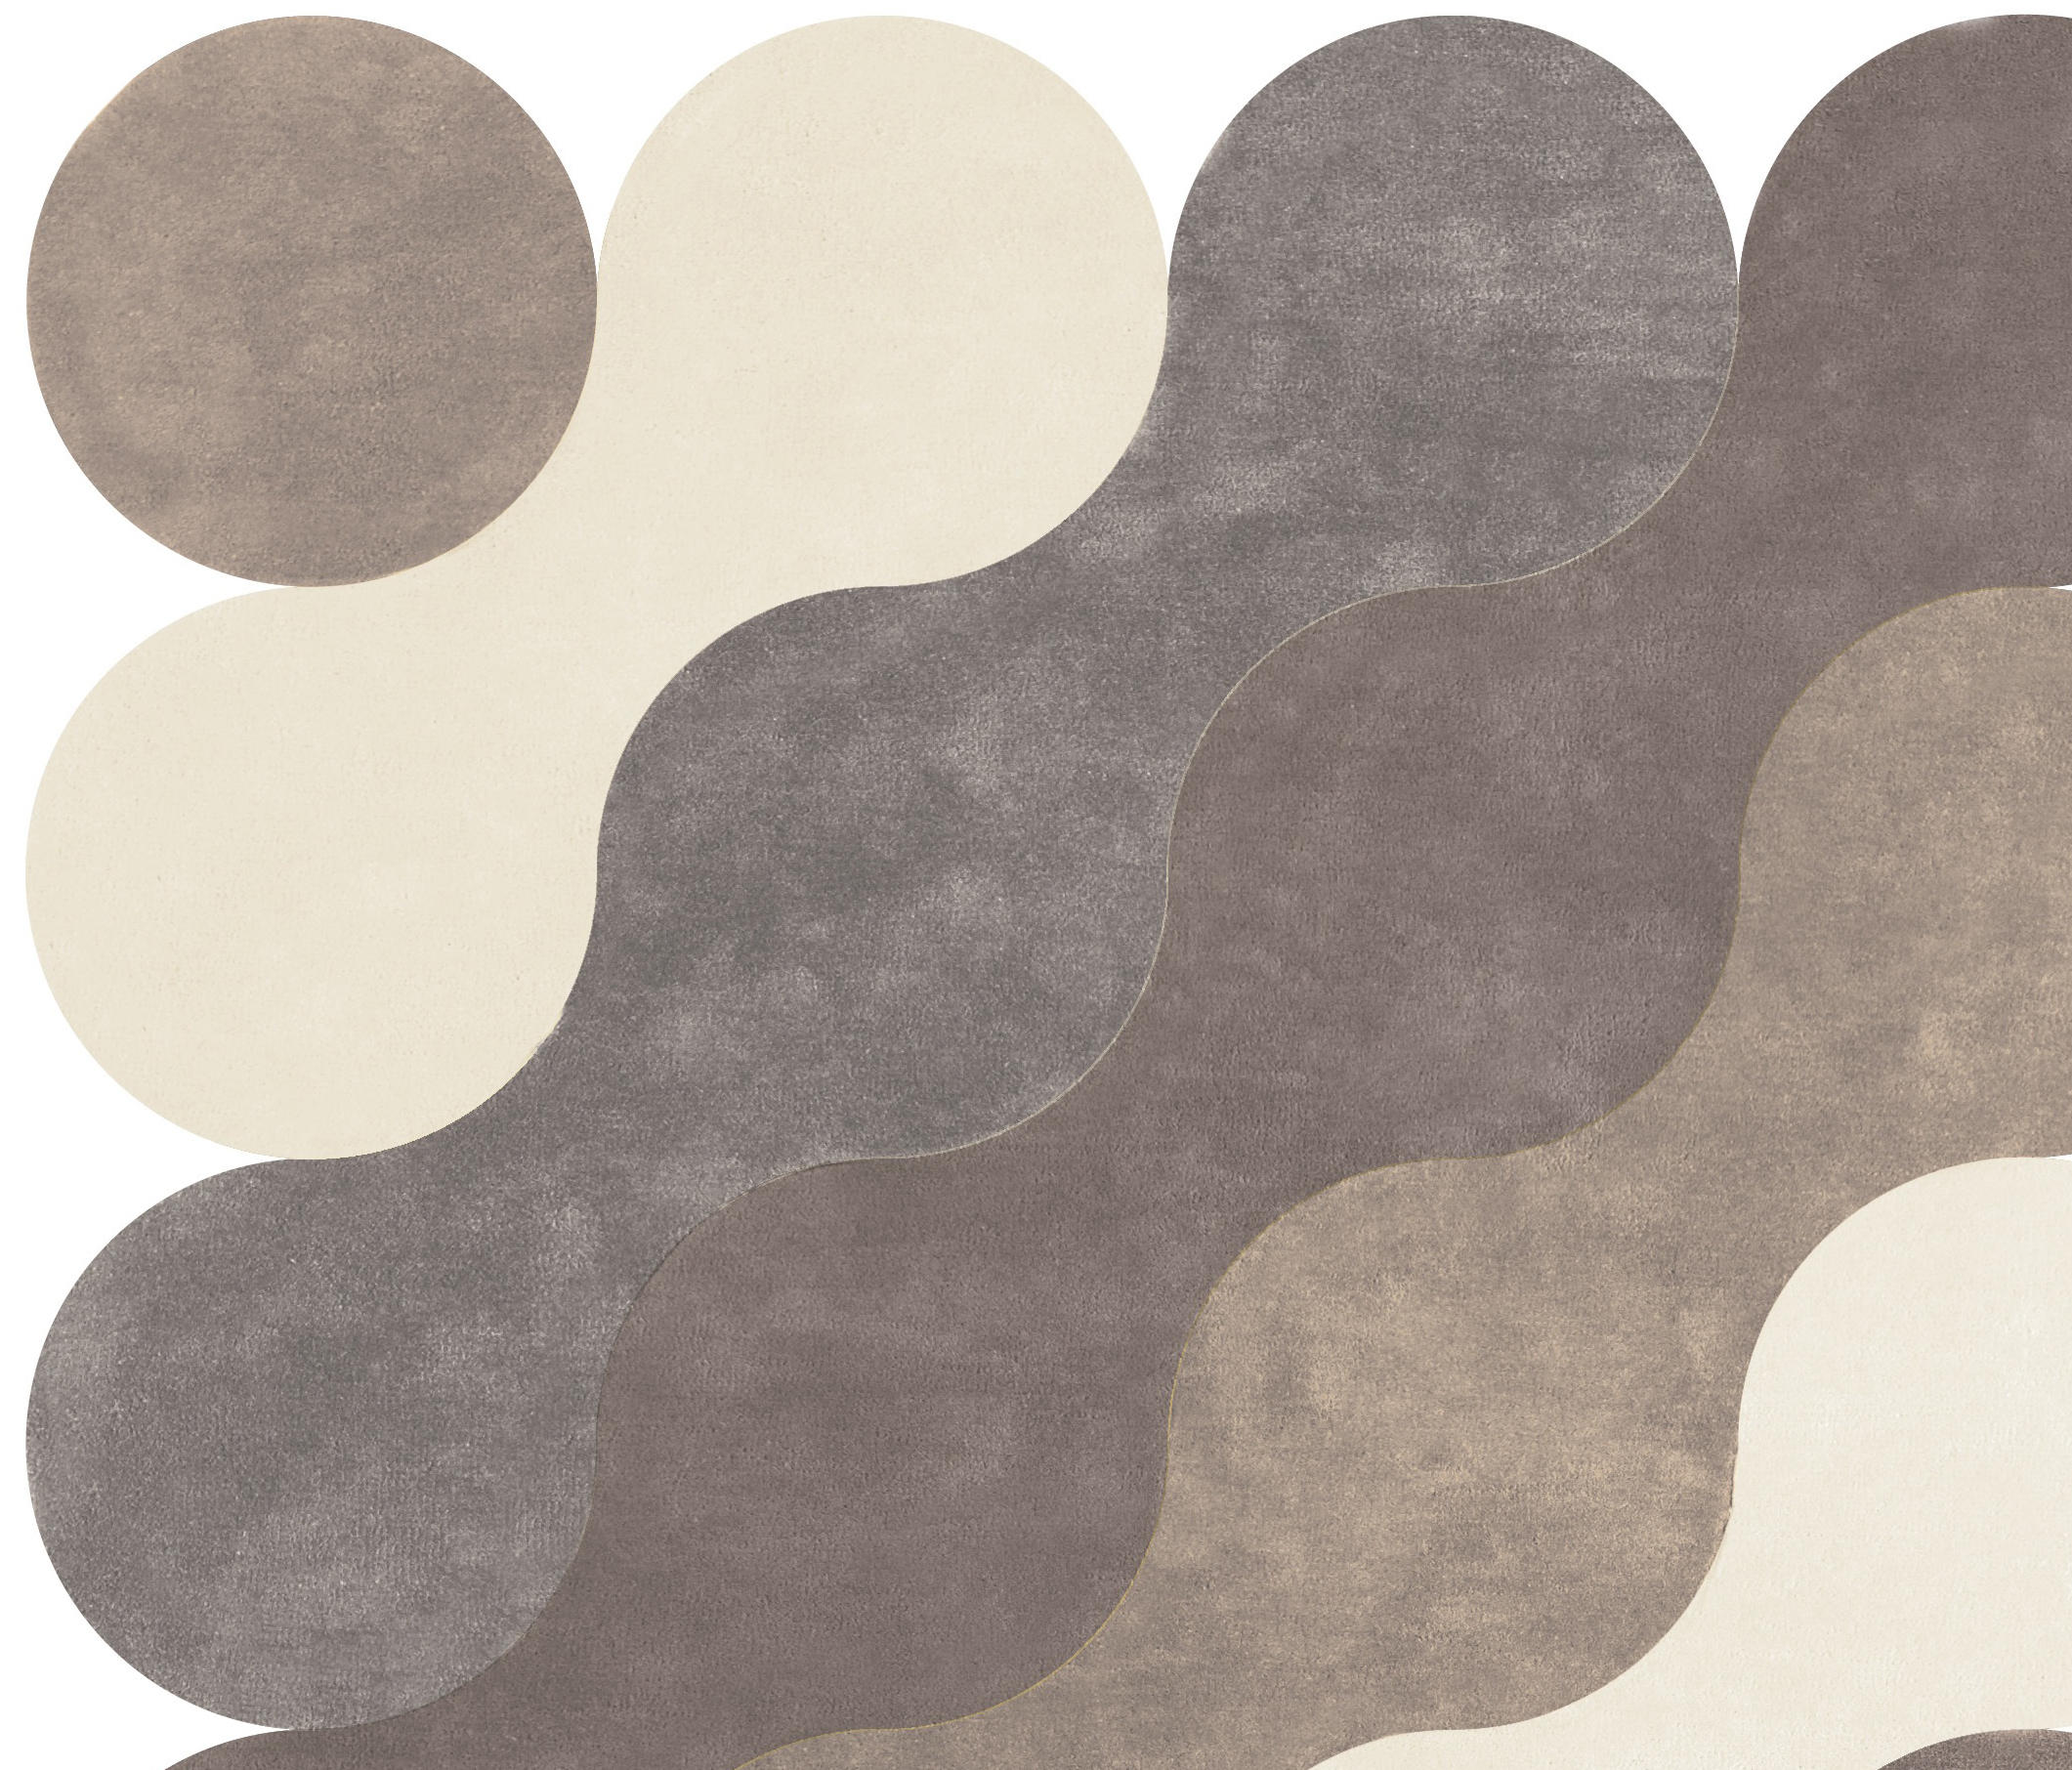 vagues de la mer - alfombras / alfombras de diseño de now carpets